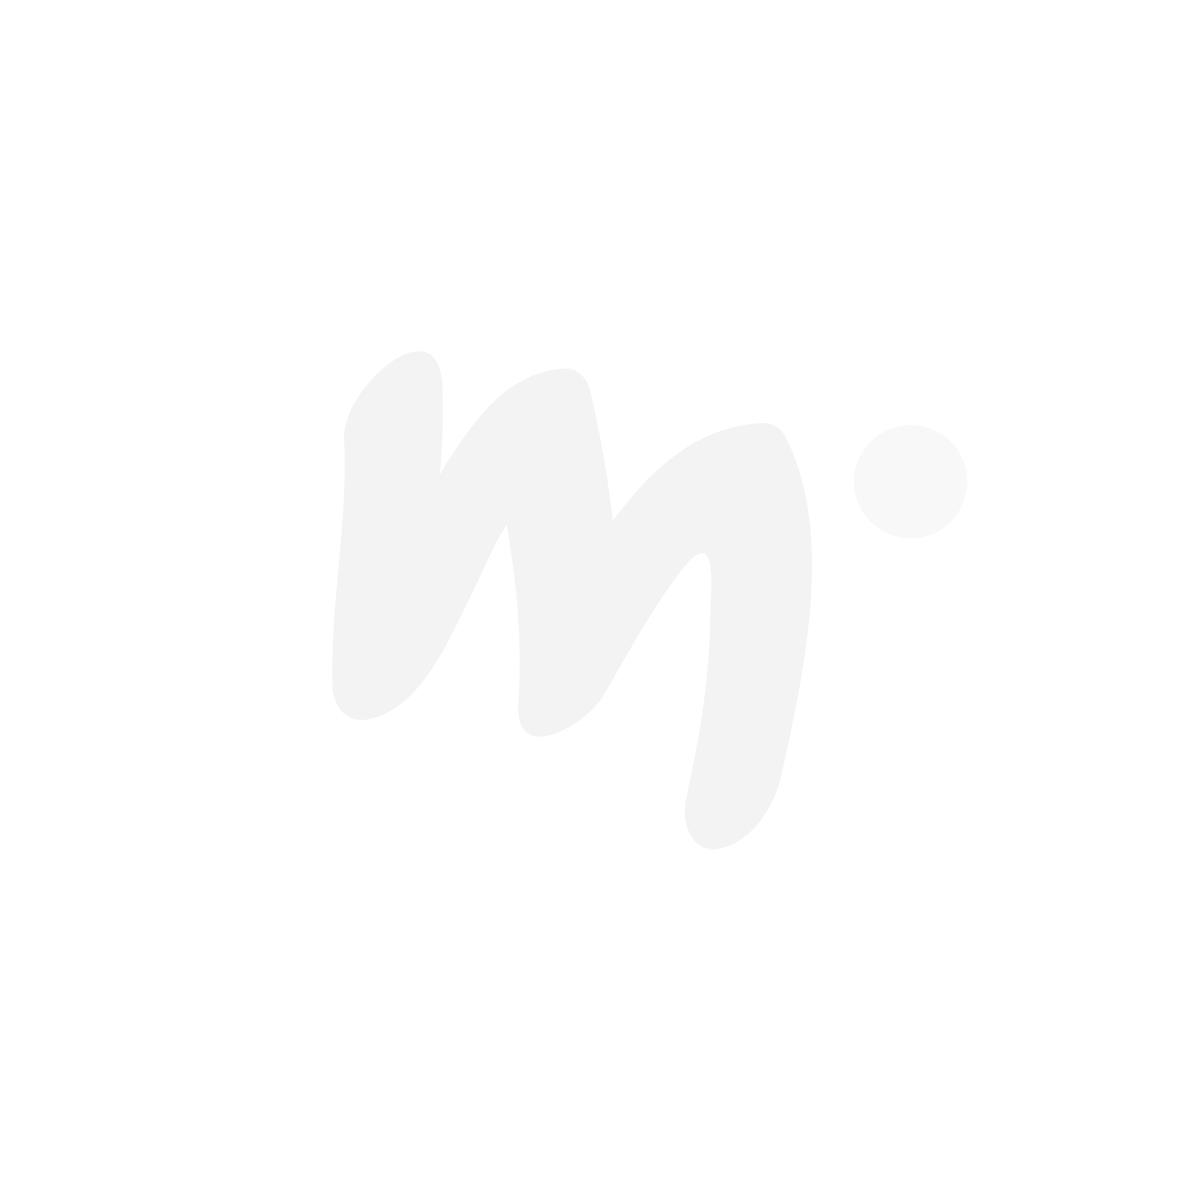 Mx Deco Glittertonttu 20 cm valkoinen